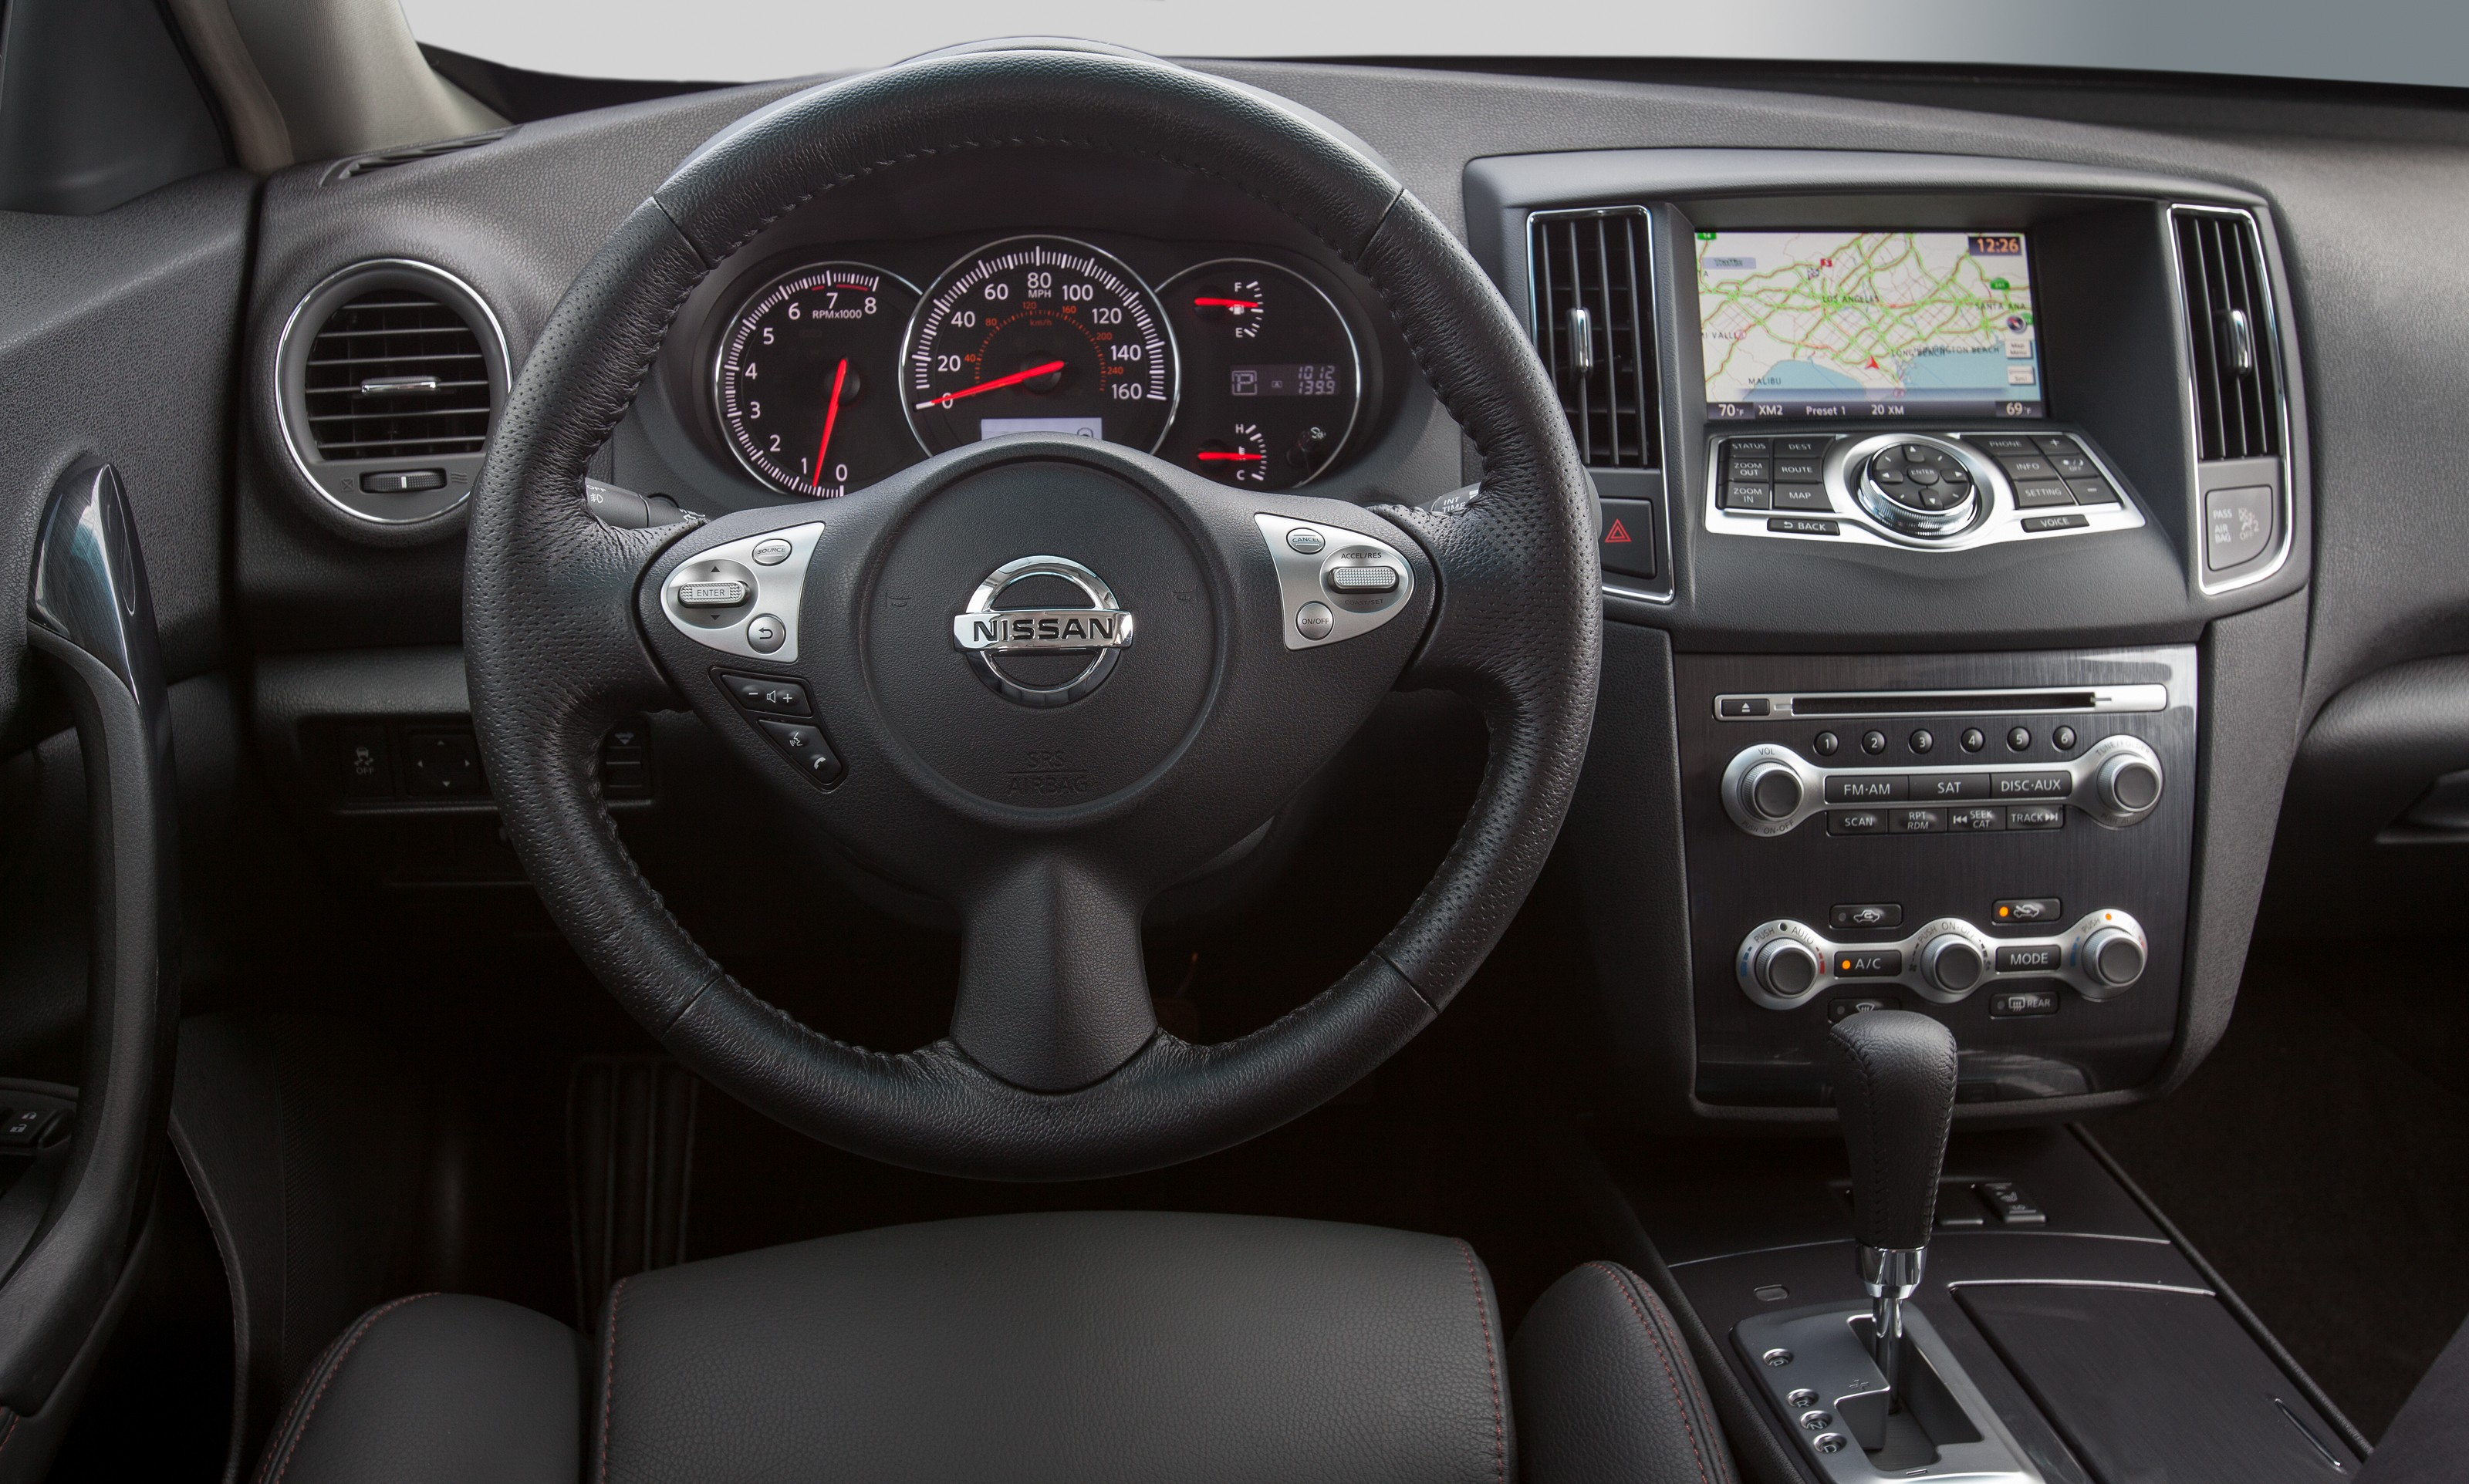 Nissan Maxima Specs Amp Photos 2009 2010 2011 2012